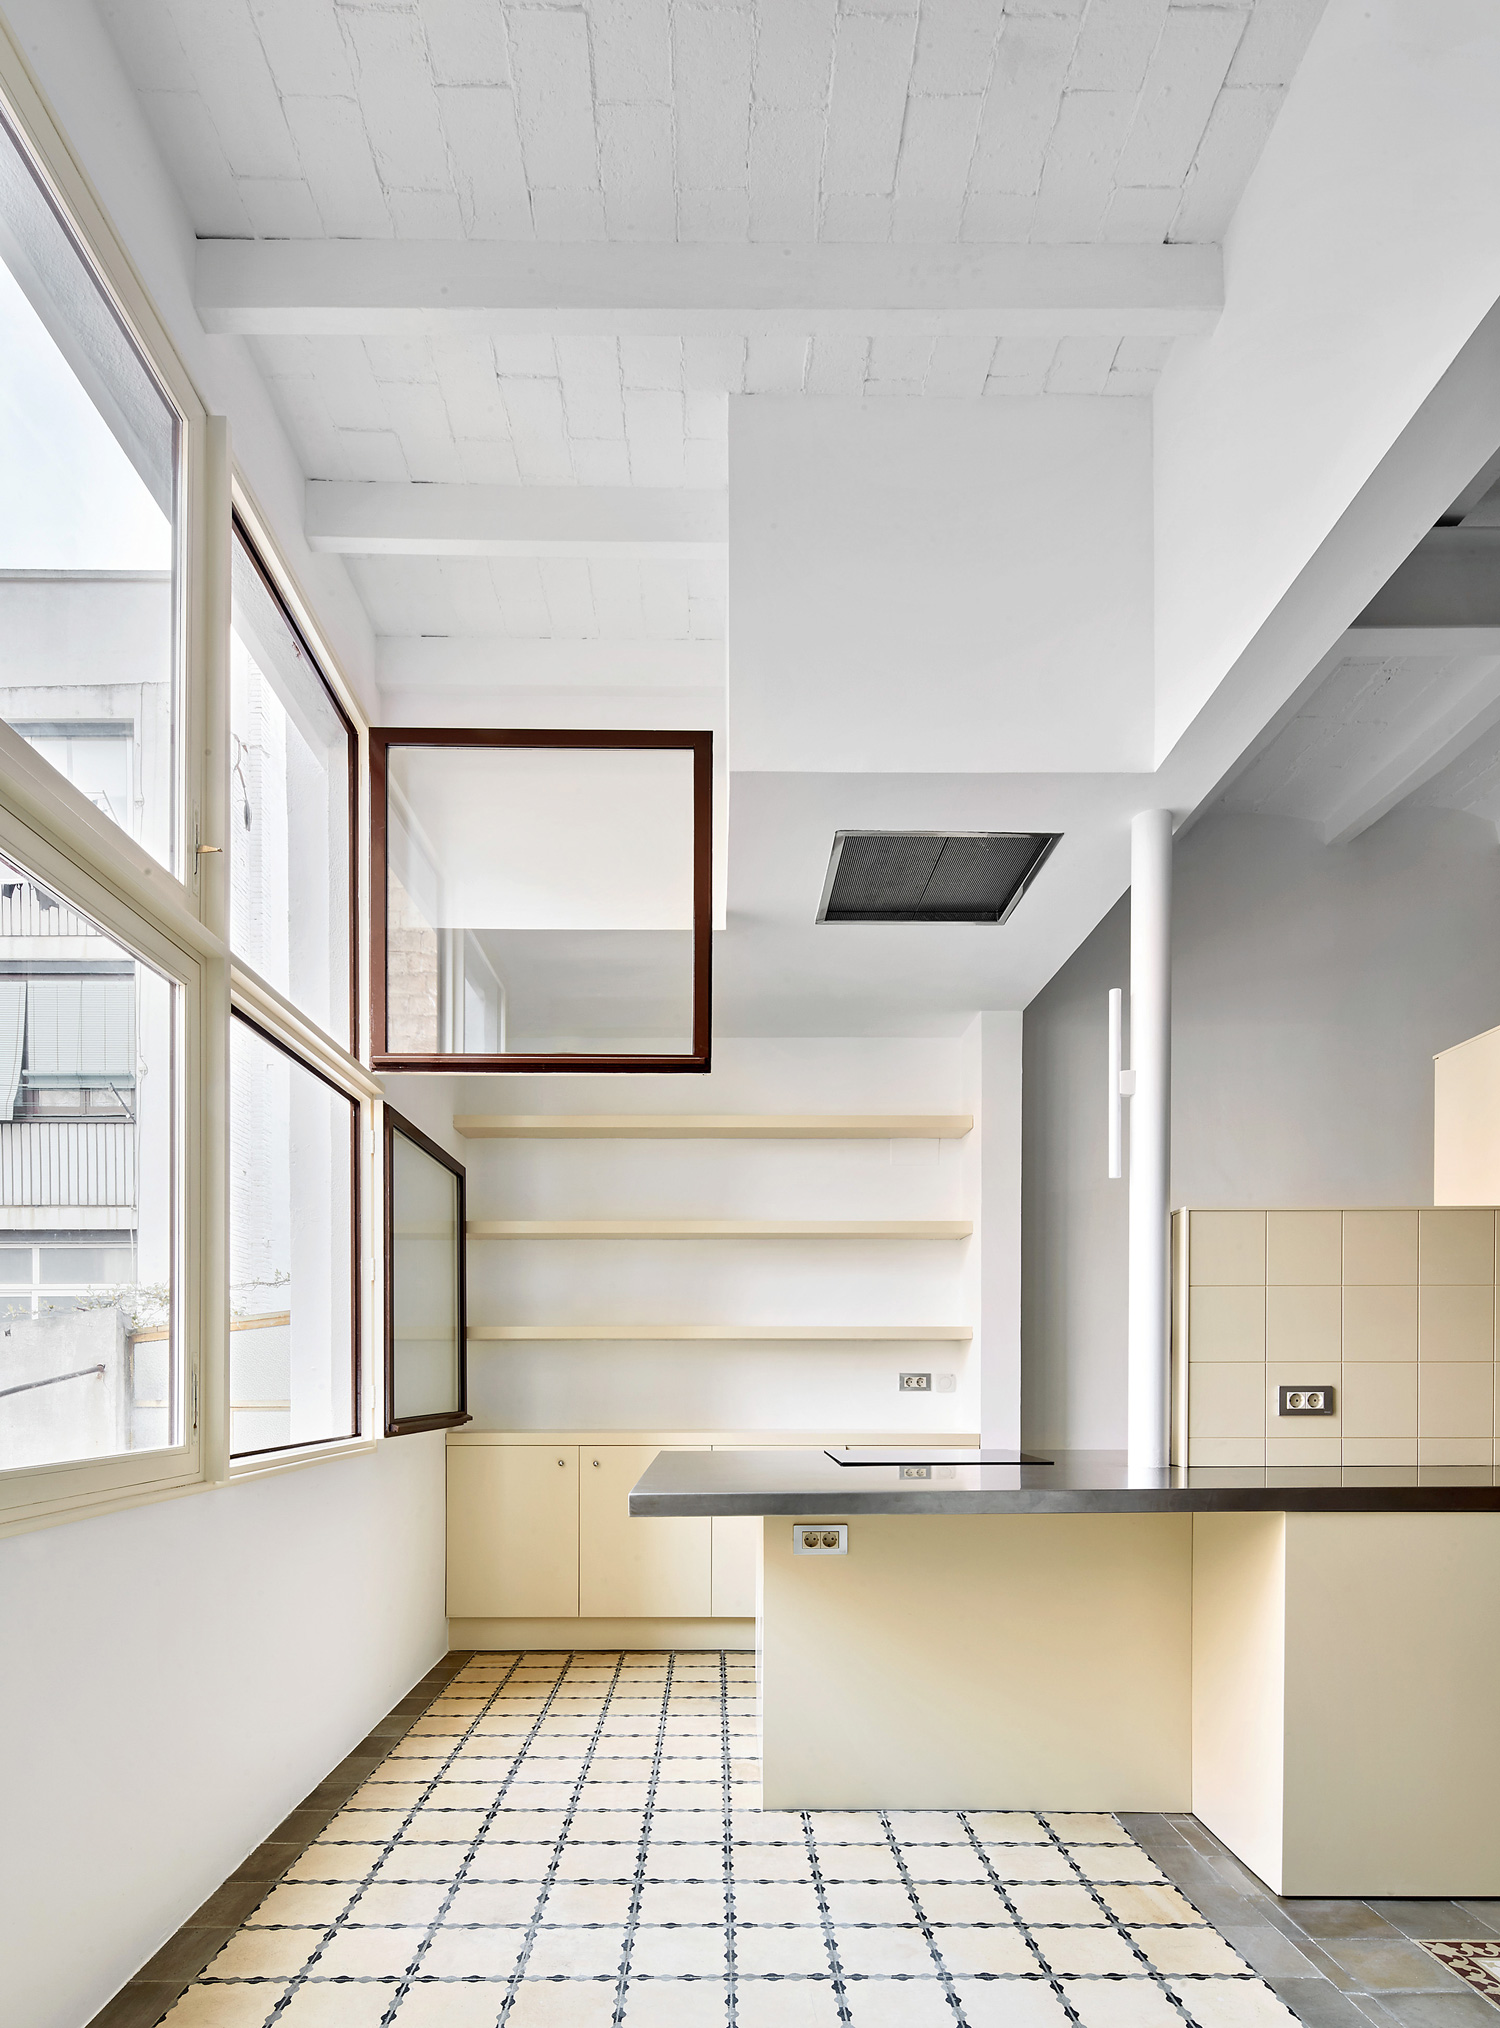 Apartmenton Mariano Cubí Street, Barcelona by Arquitectura-G | Yellowtrace